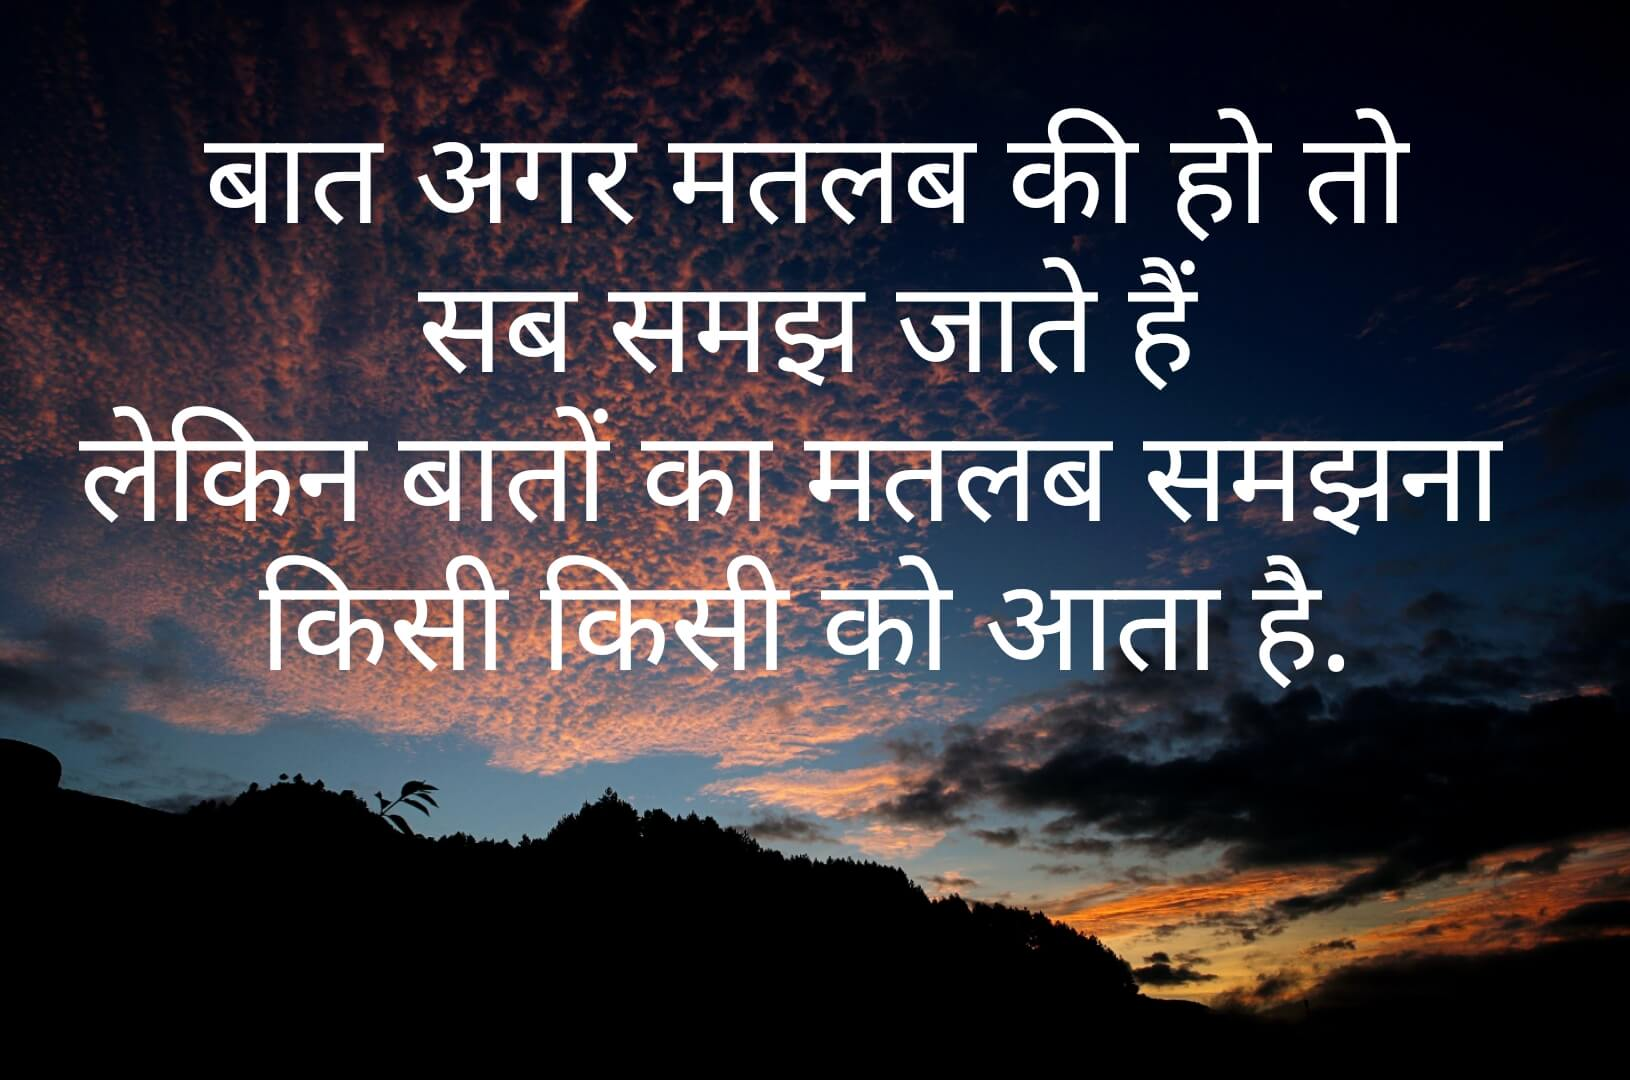 Top Motivational Shayari in Hindi